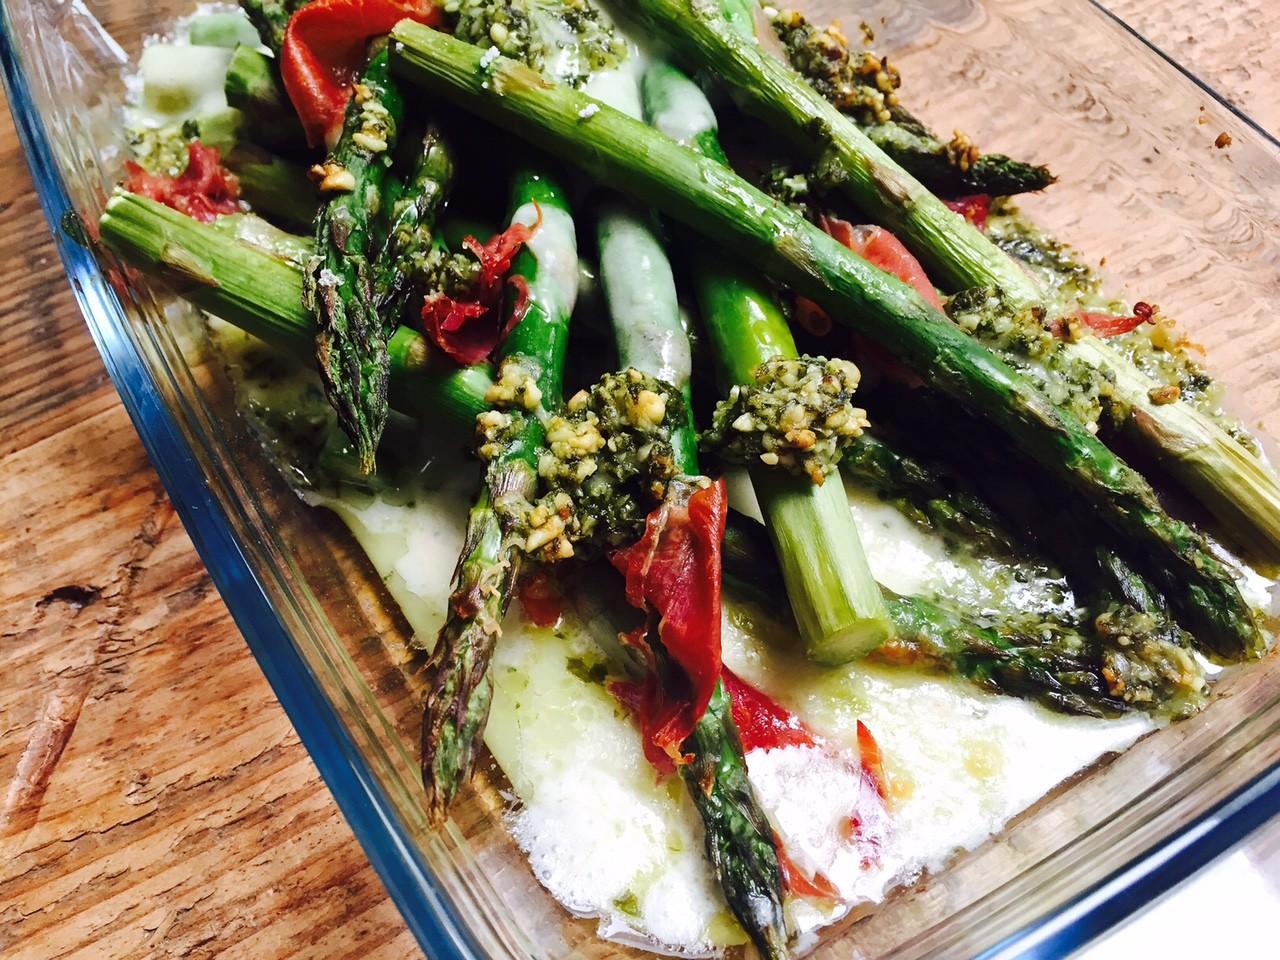 Geroosterde asperges met pesto ovenschotel foodblog Foodinista